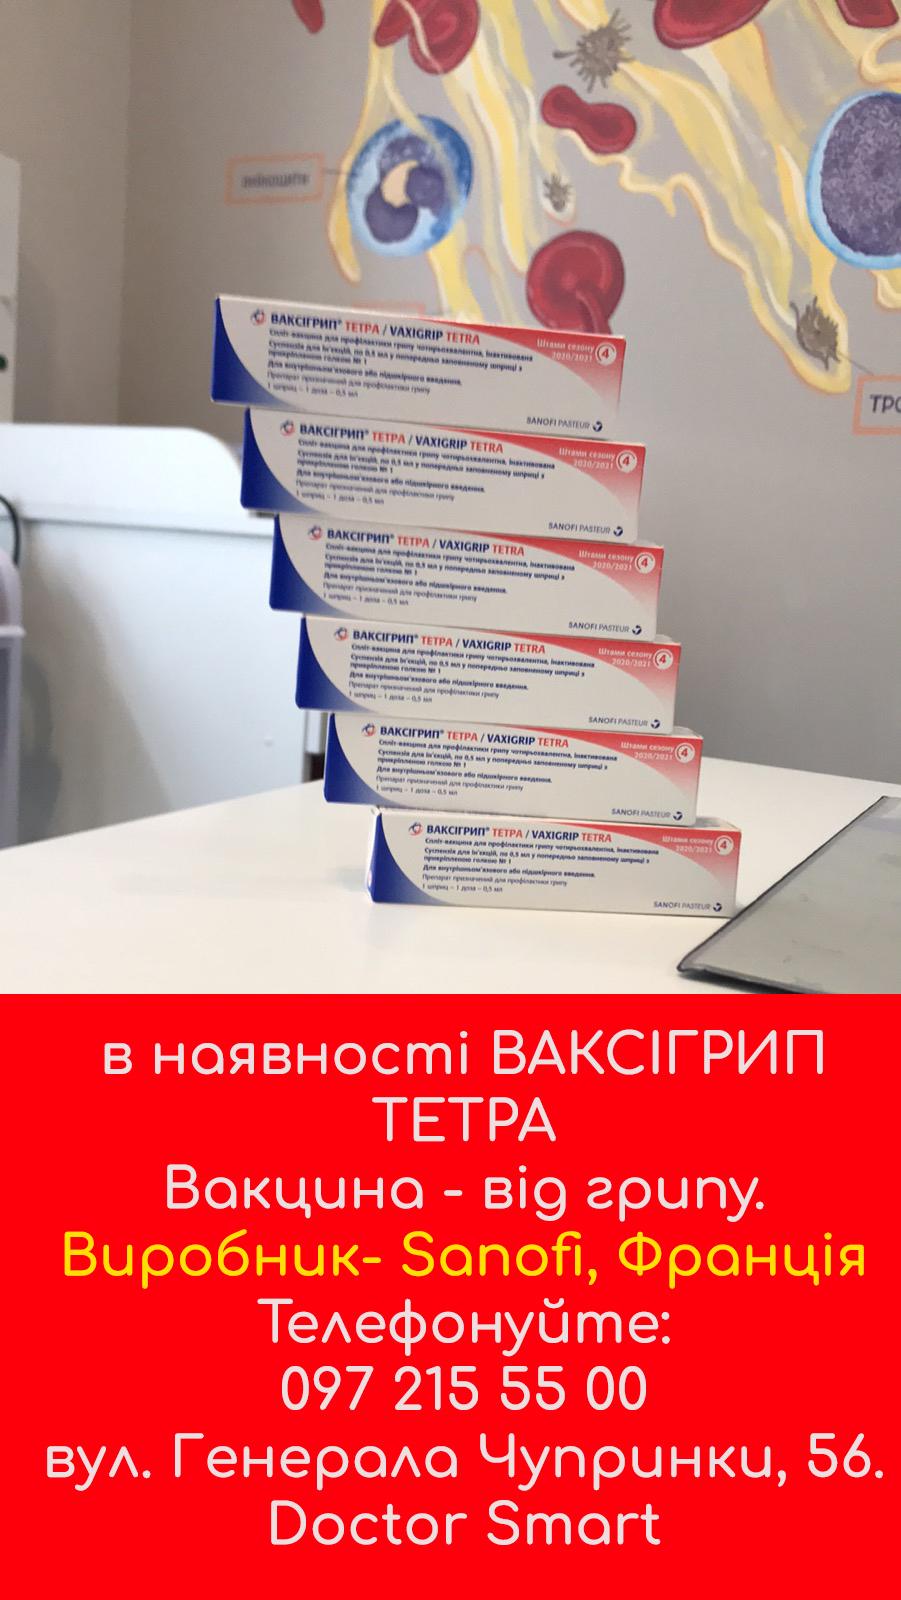 Vaxiflue.jpg